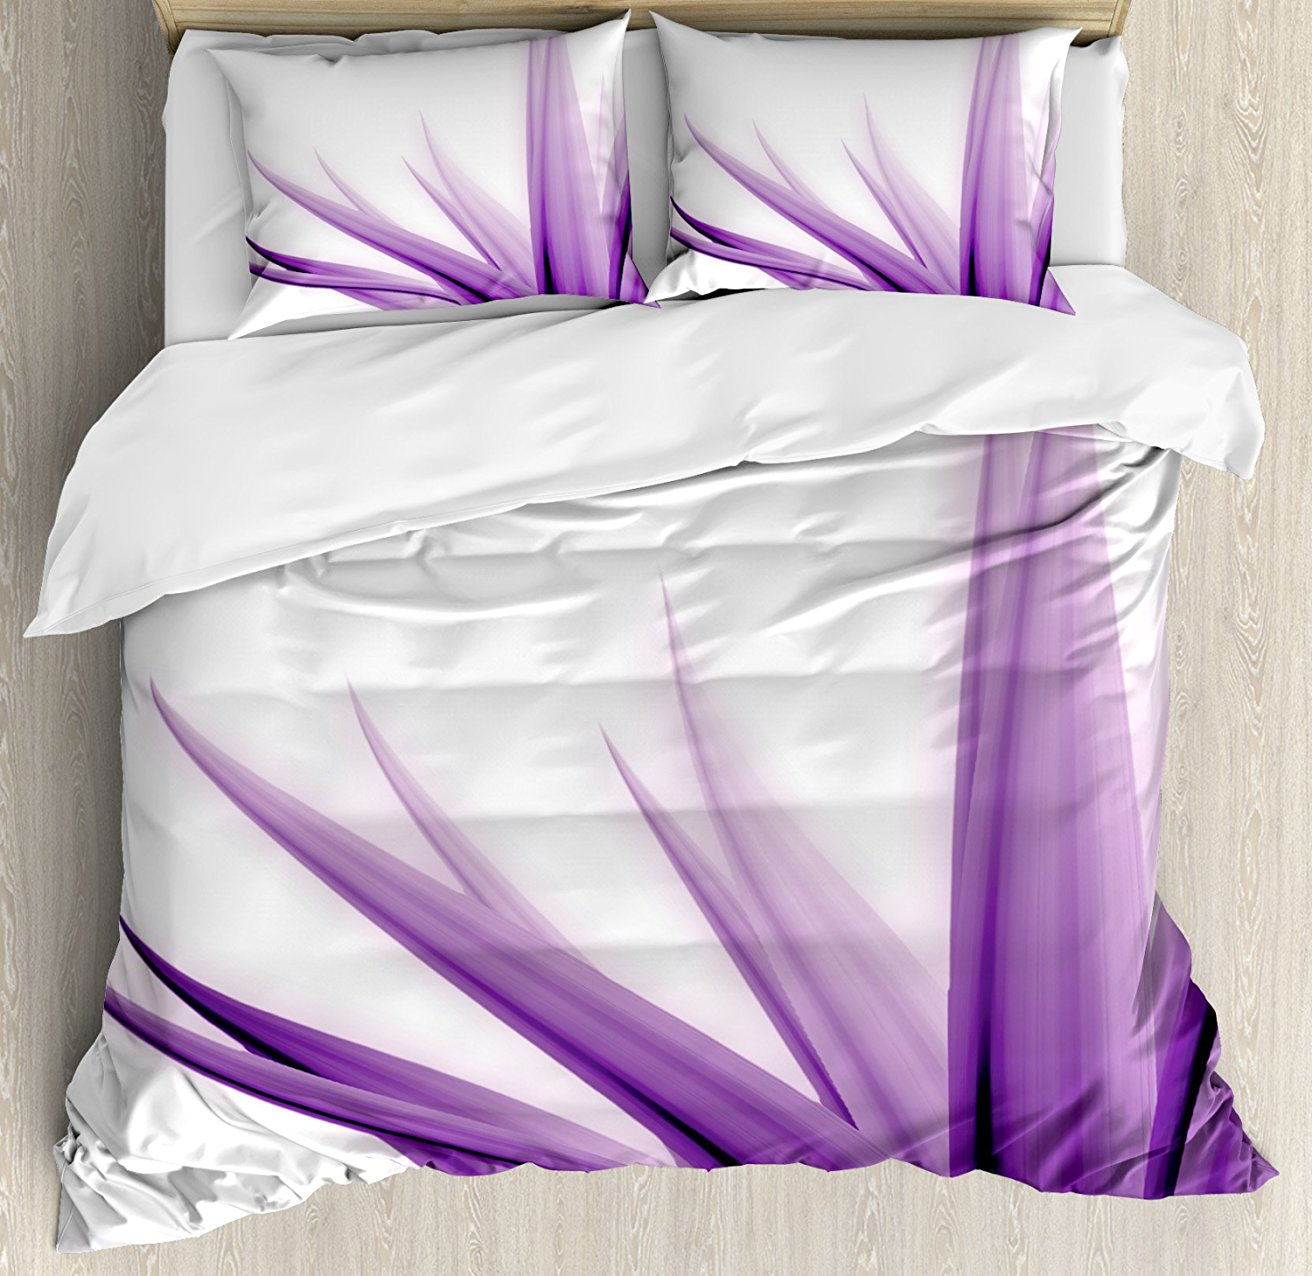 Flower Decor Duvet Cover Set, Purple Ombre Long Leaves Water Colored Print with Calming Details Image, 4 Piece Bedding Set